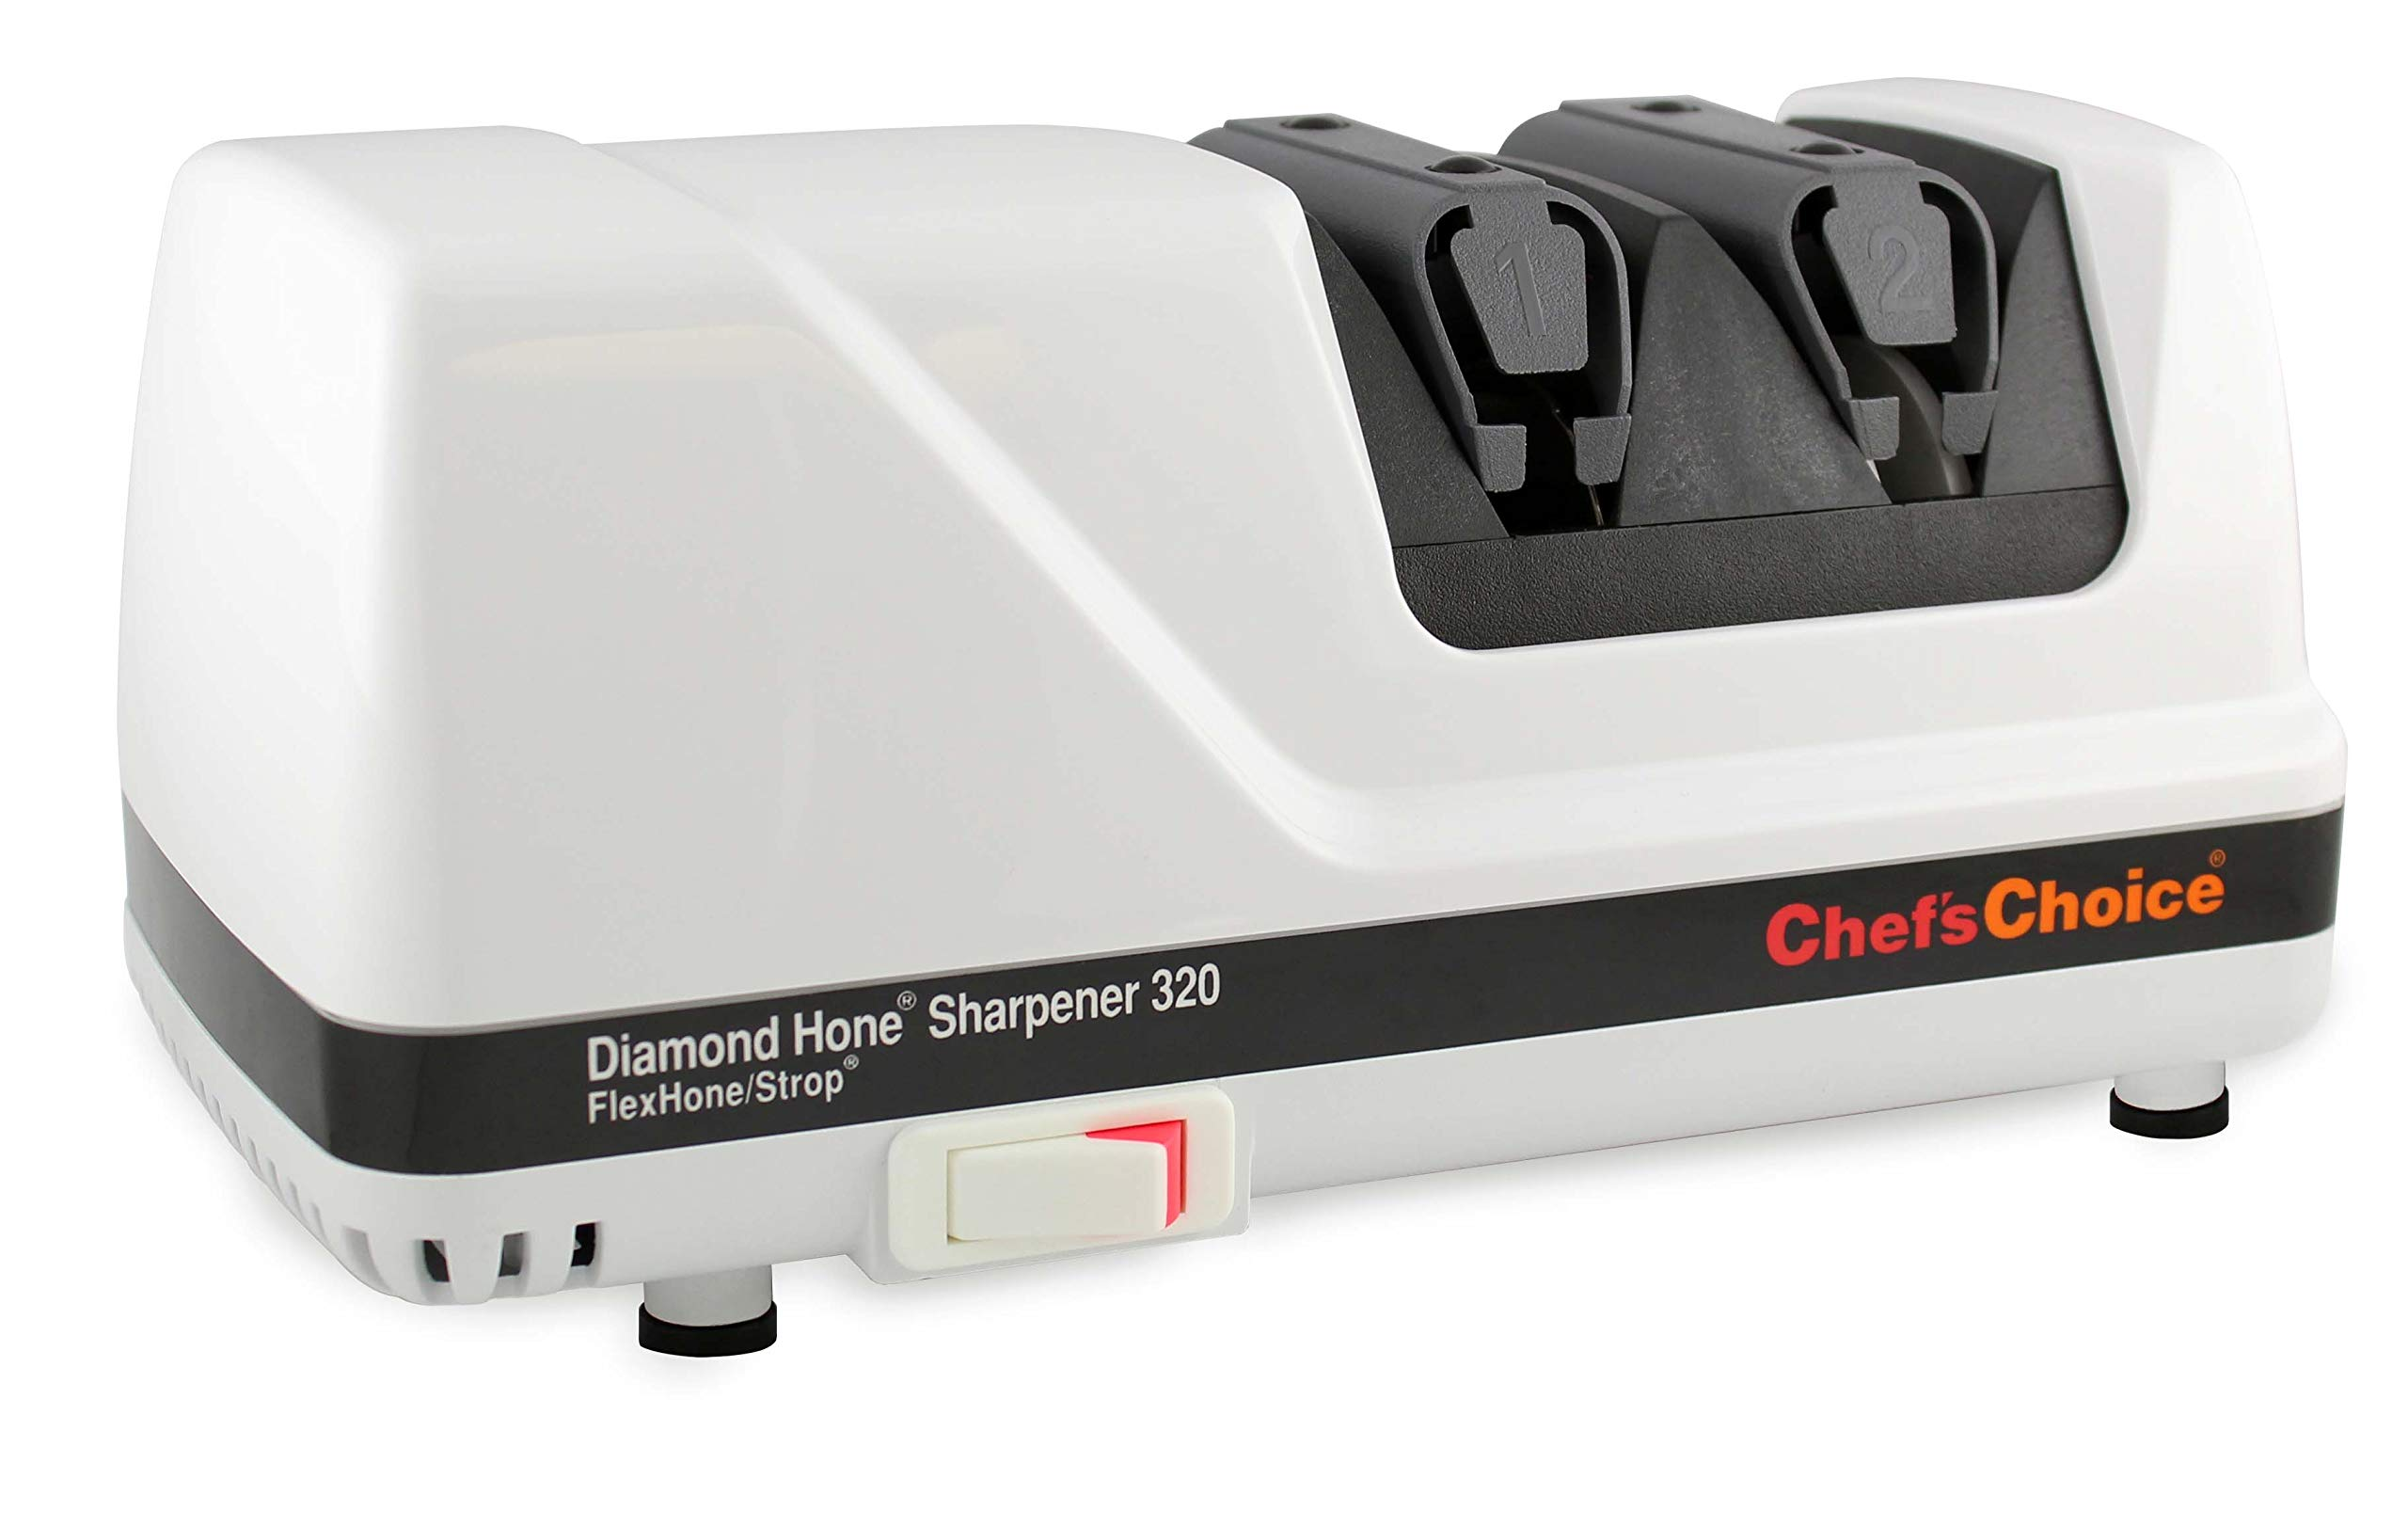 71oizlbKveL - Chef's Choice Diamond honed two-stage rotary sharpener, Model 320